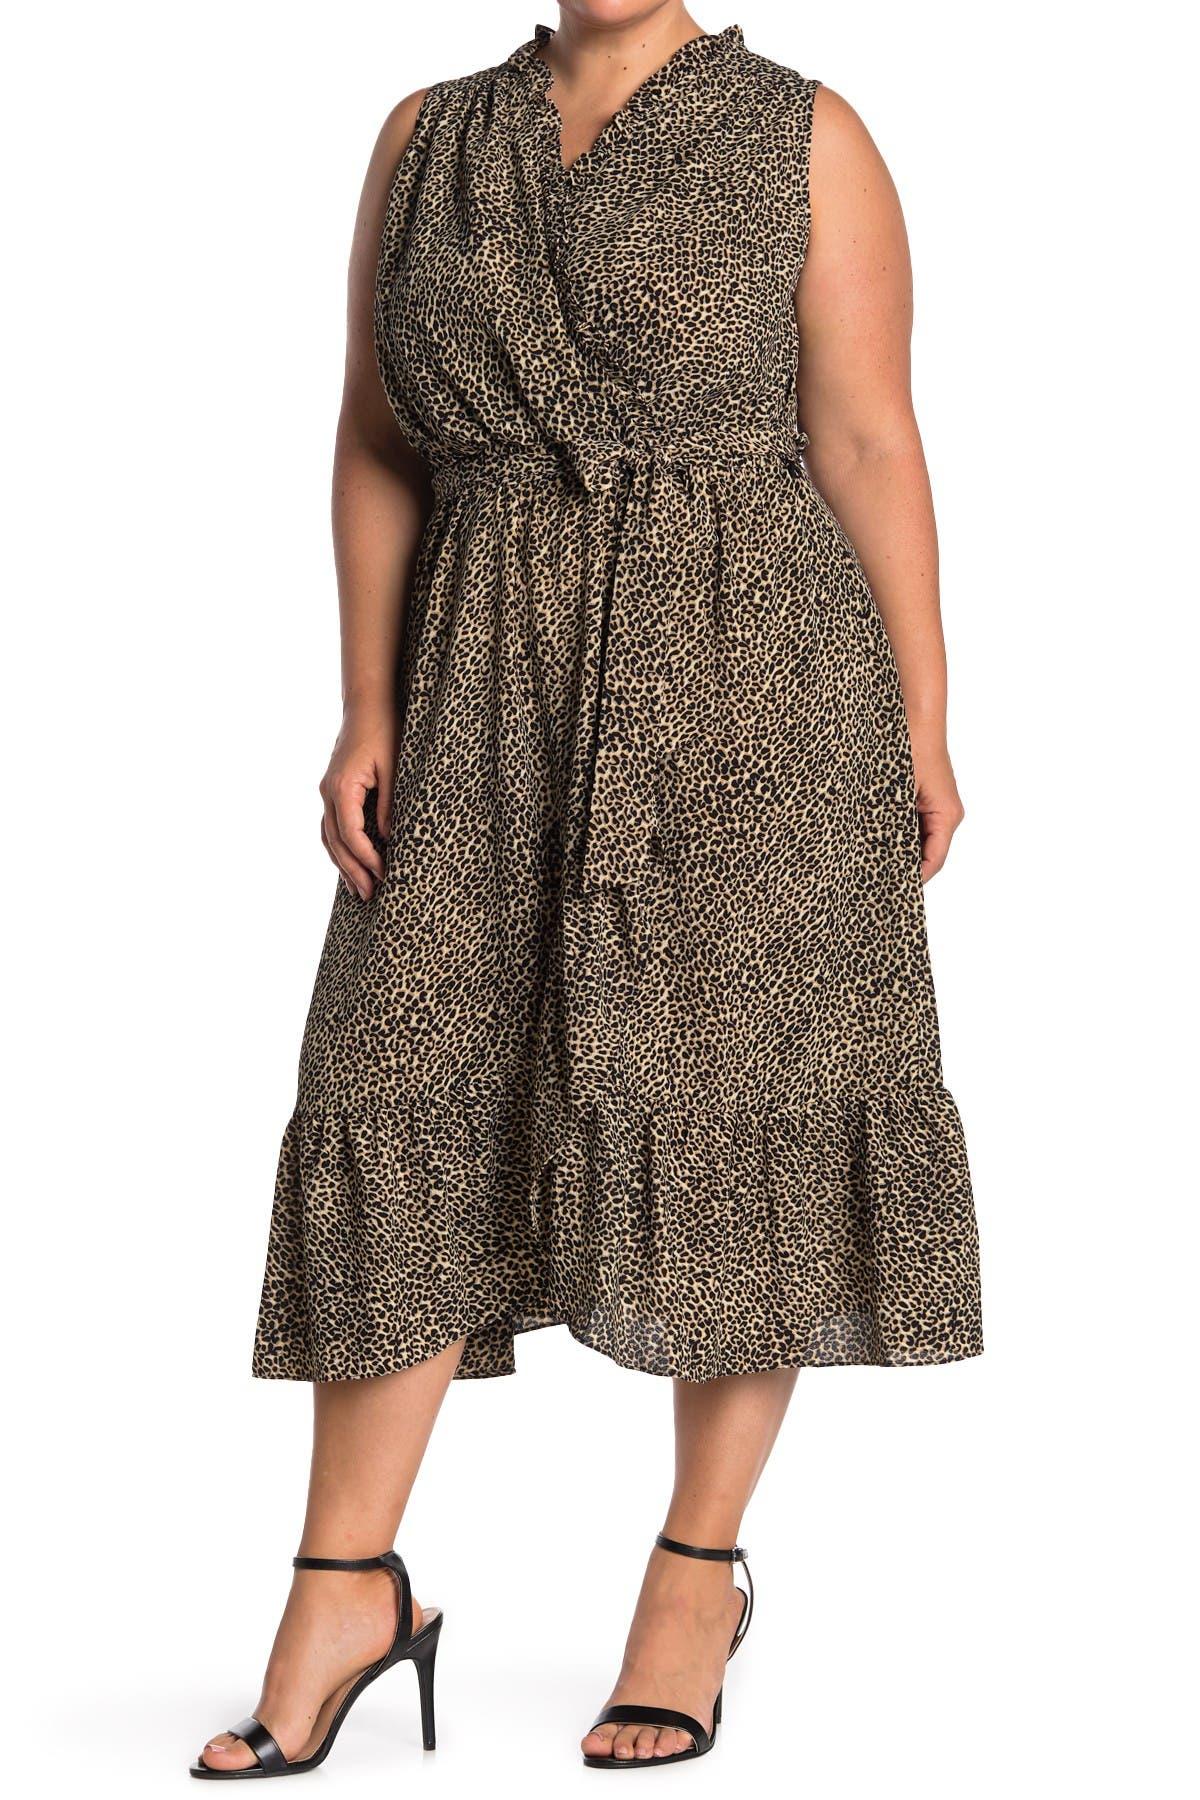 Image of London Times Leopard Print Ruffled Sleeveless Wrap Midi Dress